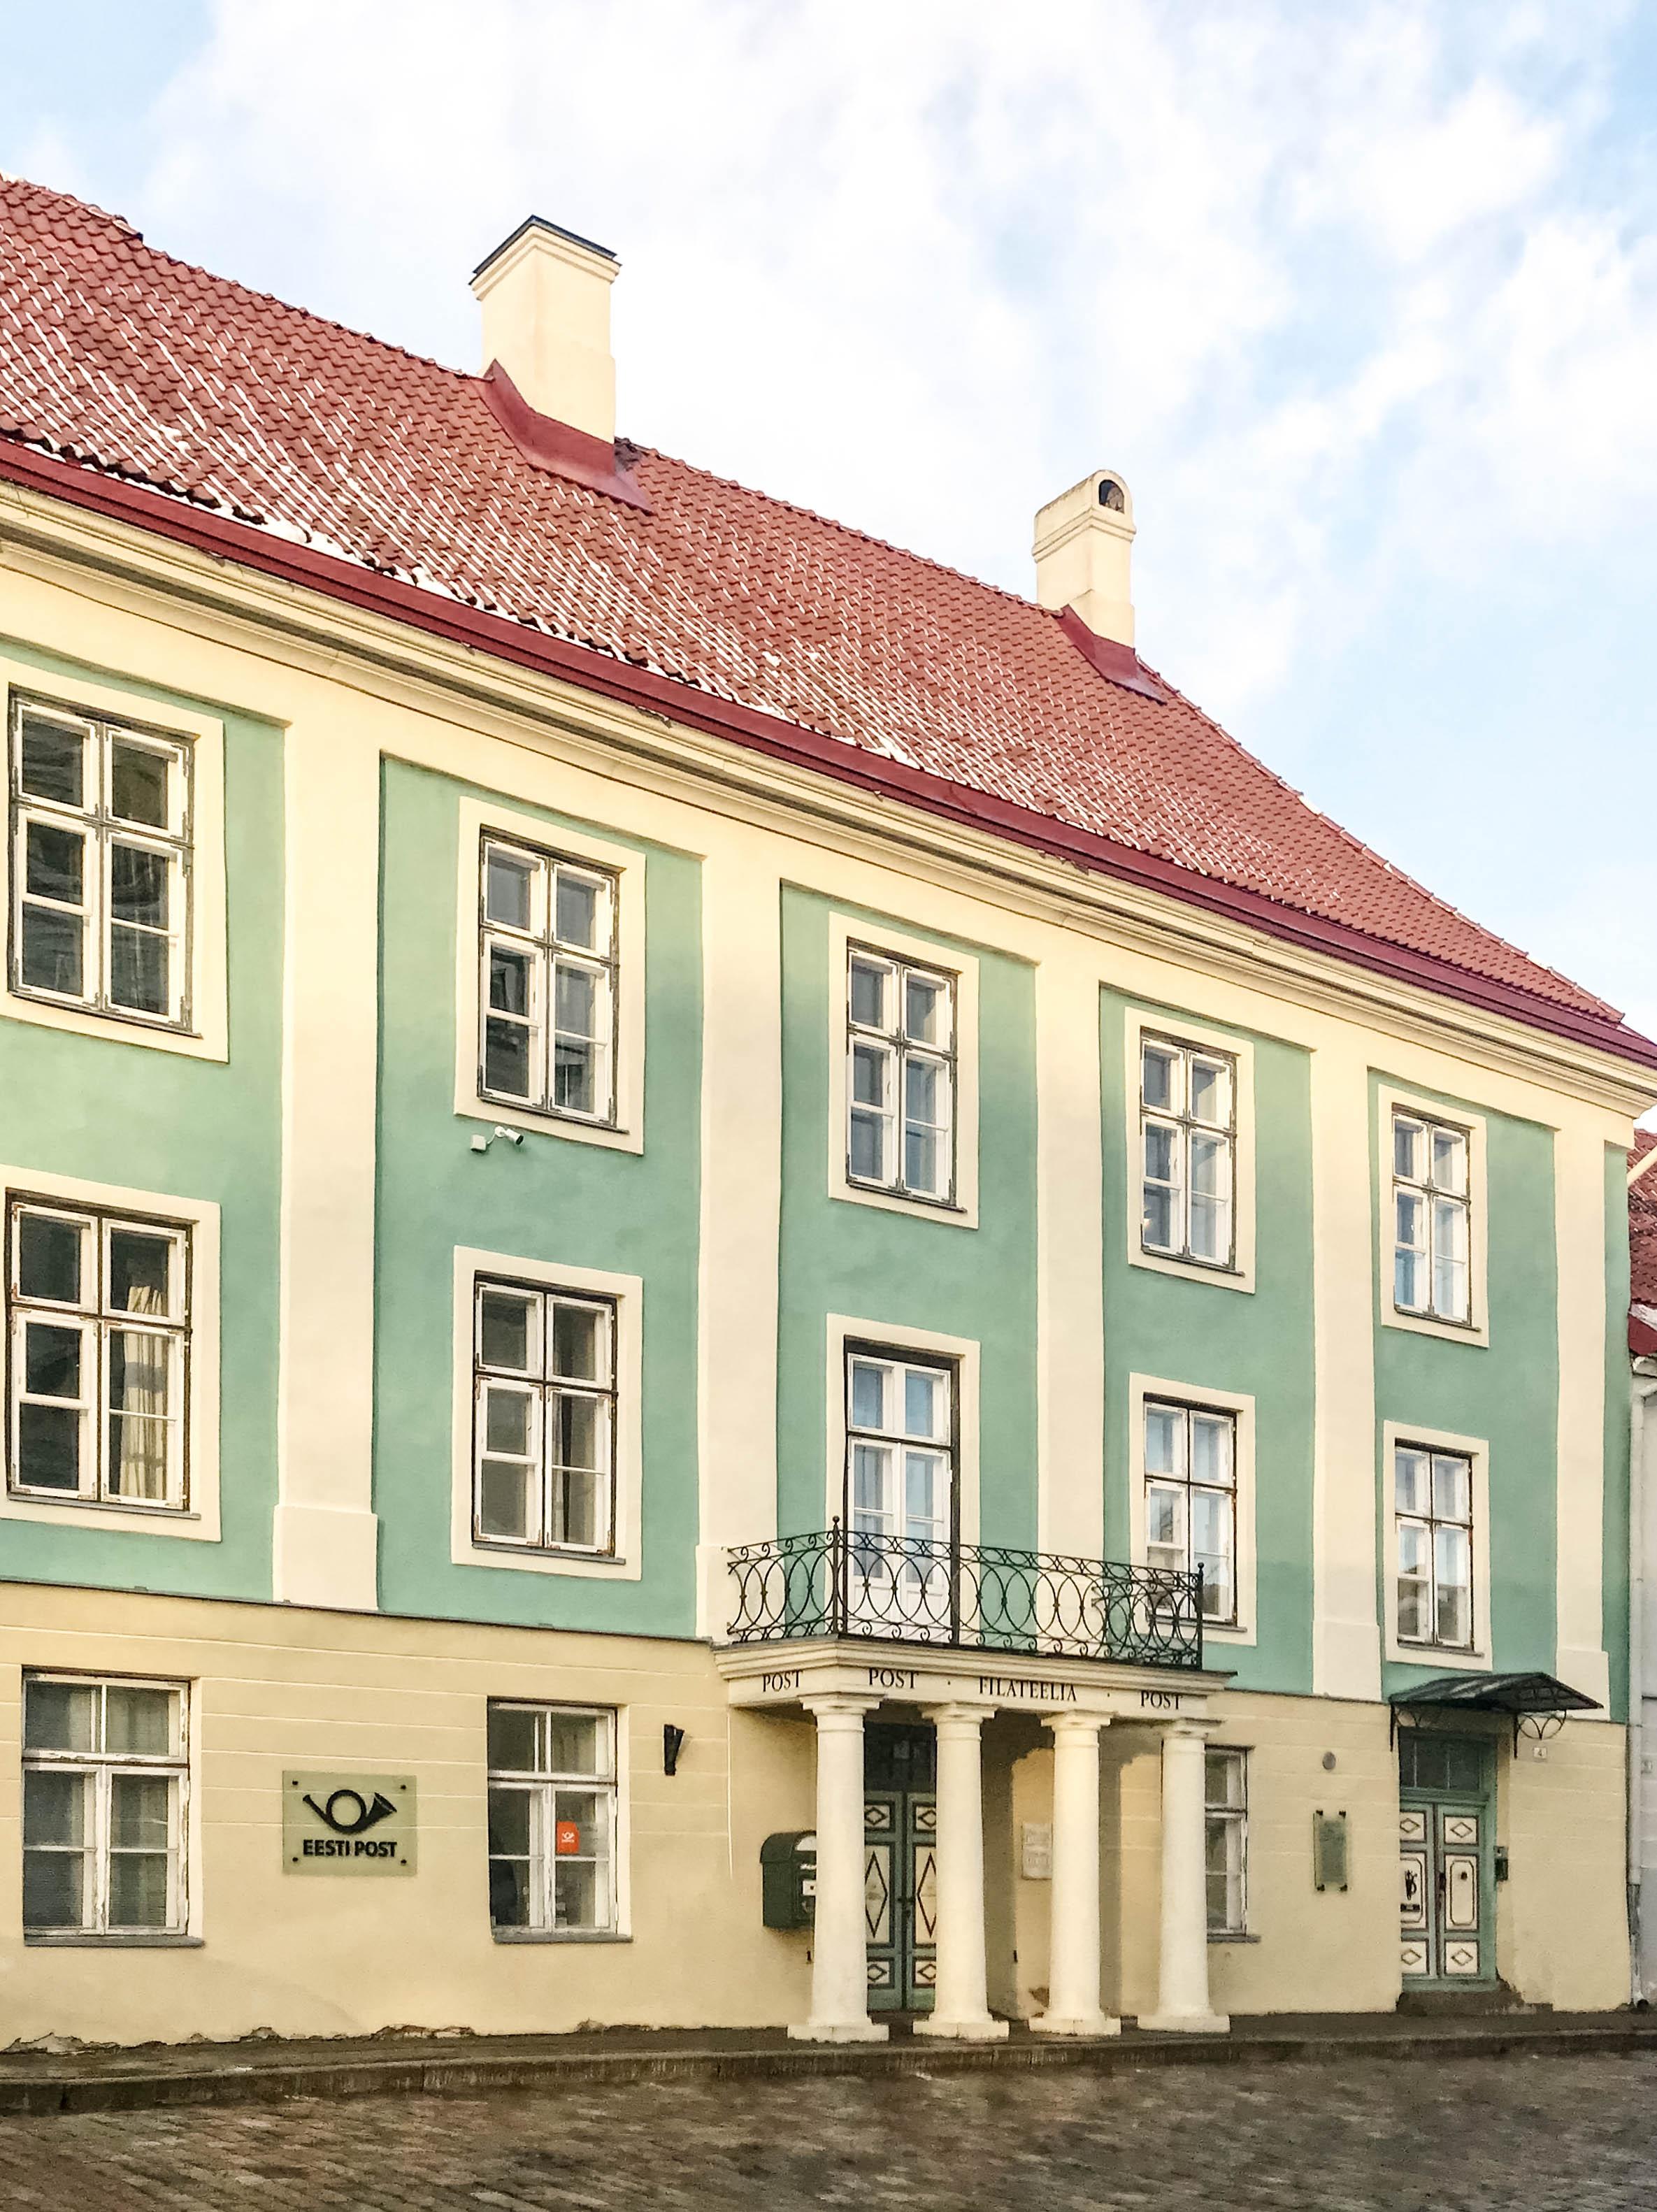 Post am Domberg Tallinn